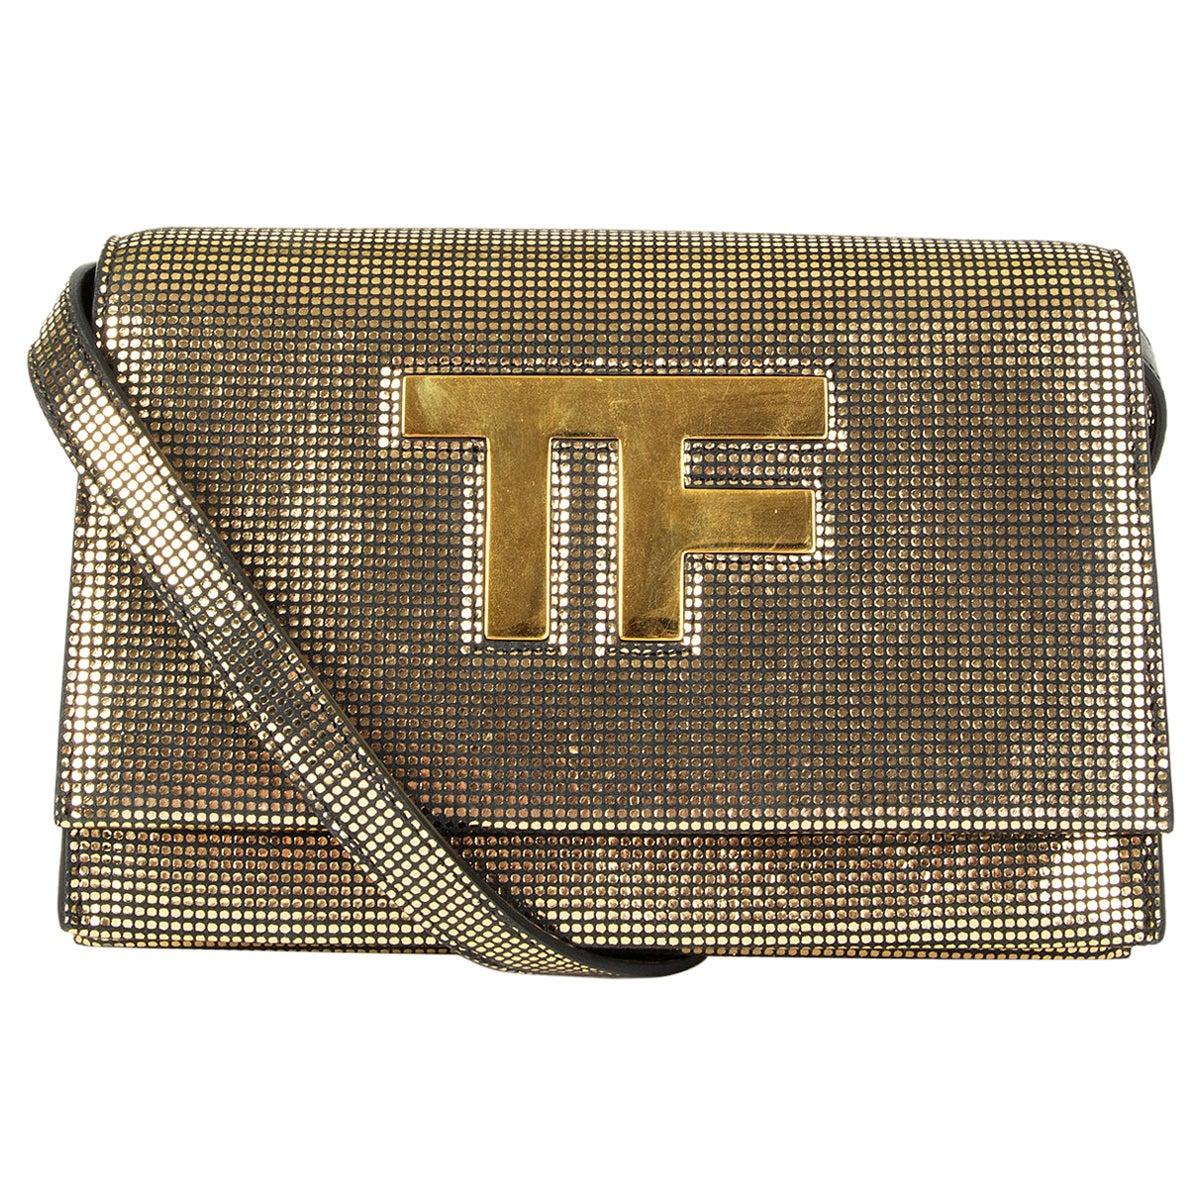 TOM FORD metallic gold leather TF Flap Crossbody Bag Clutch